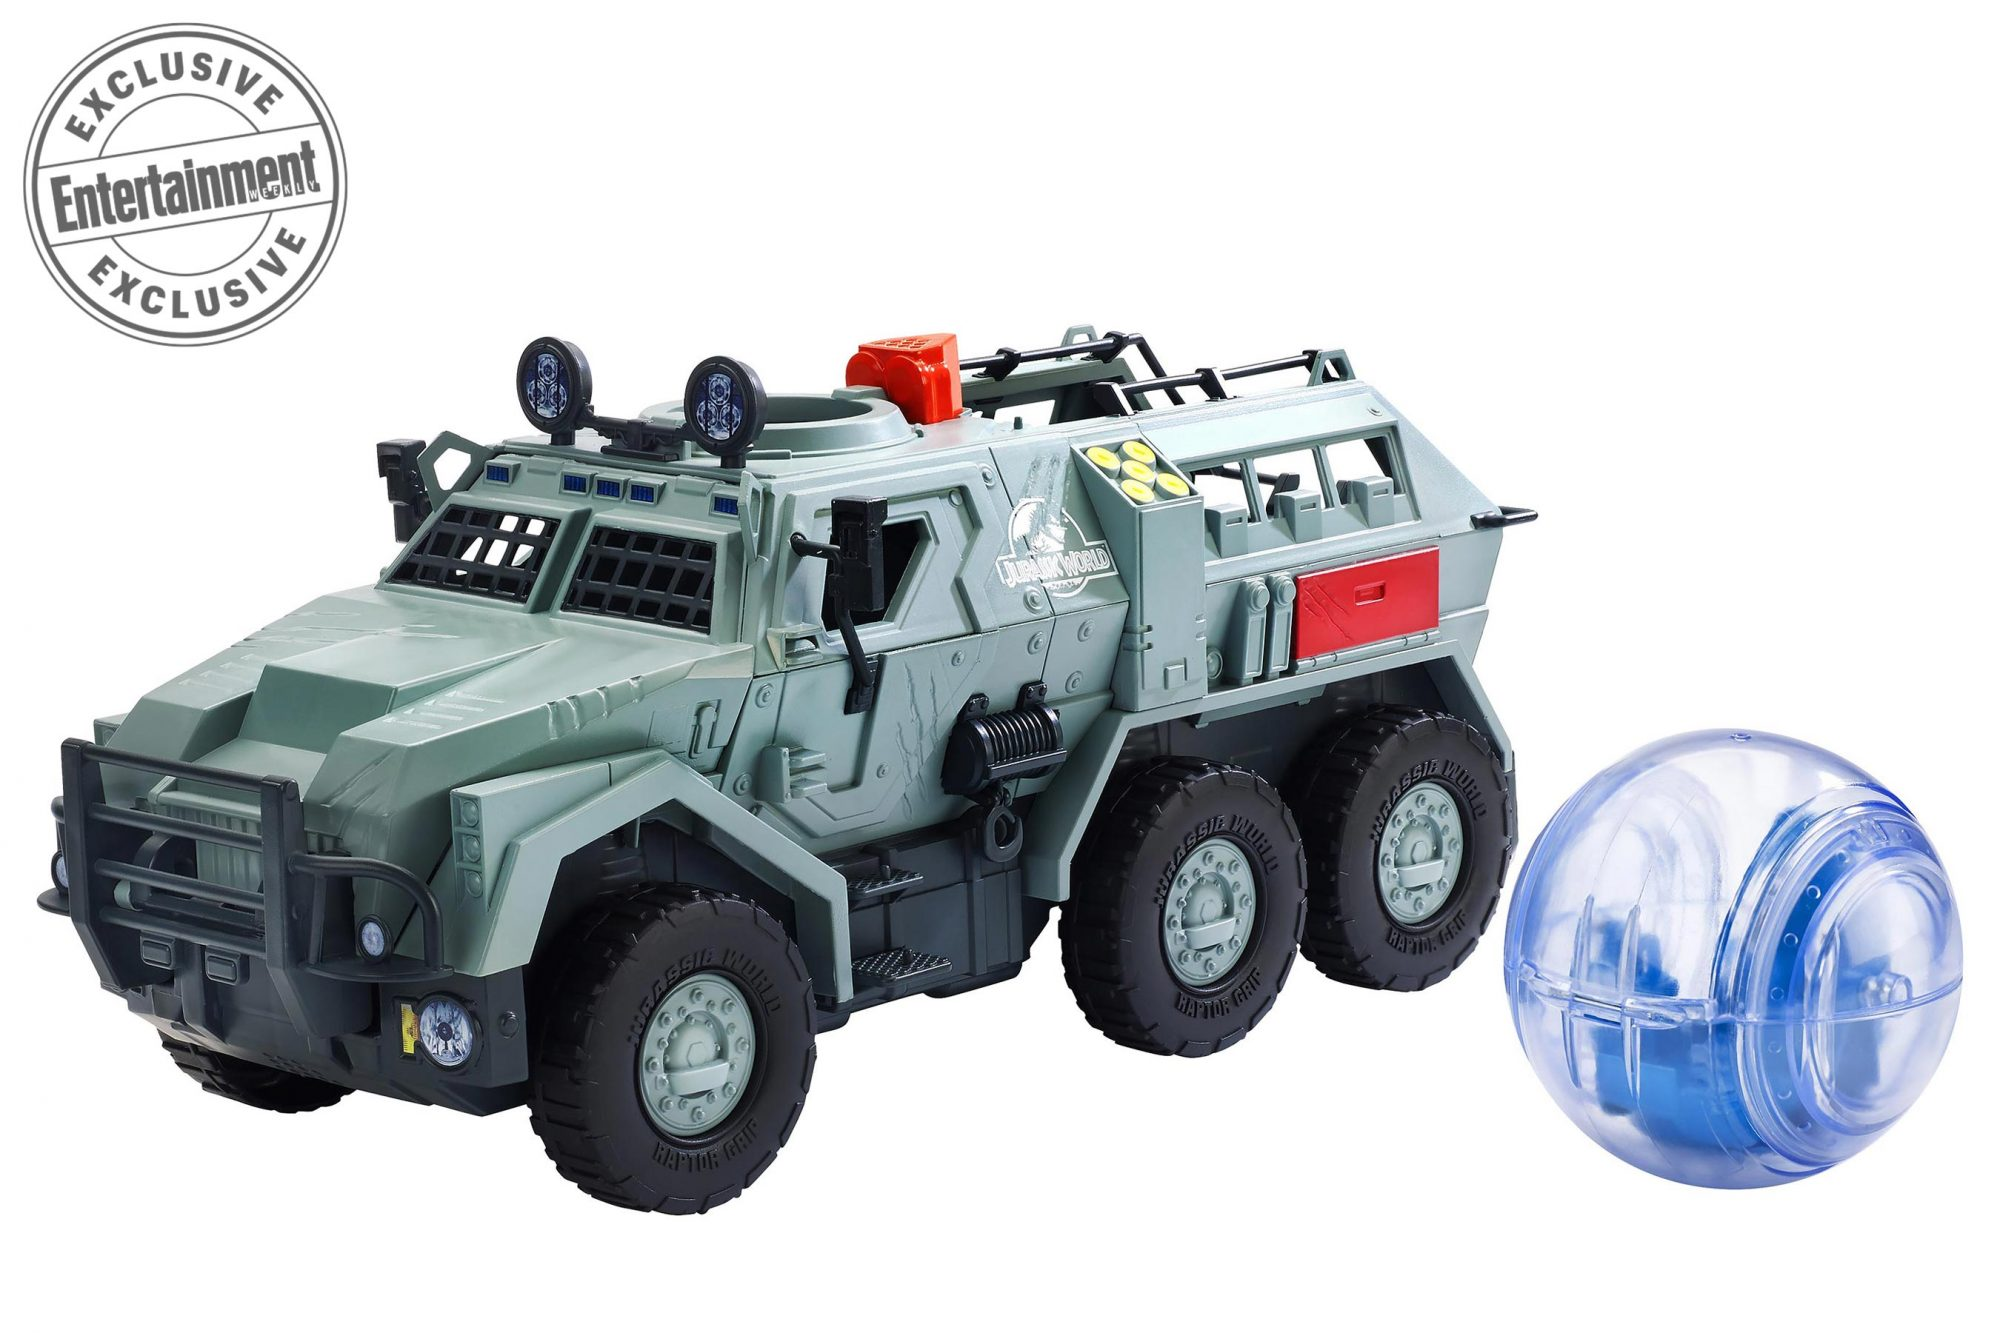 Jurassic-World-Toys-7